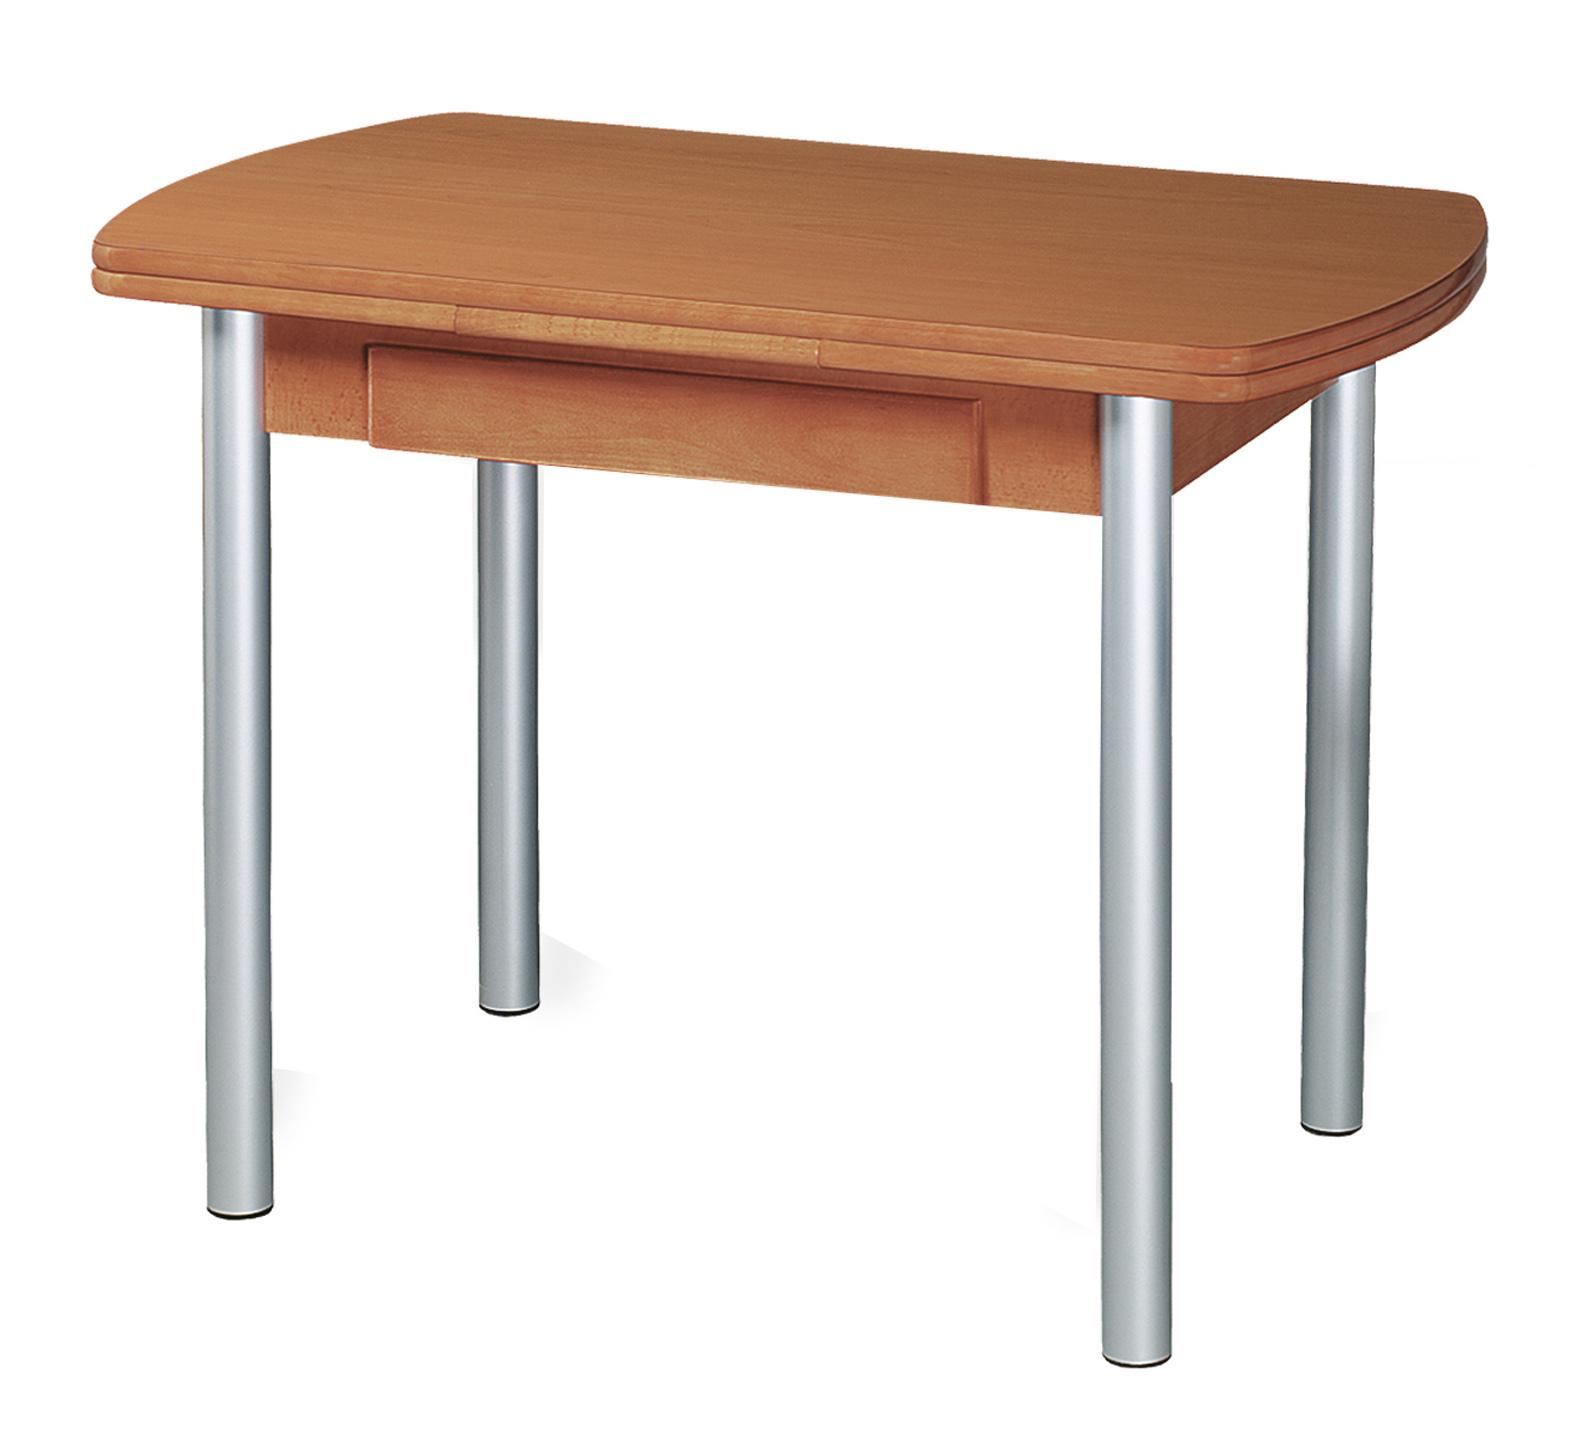 Mesa cocina oval 100 decora descans complementos mueble for Precios de mesas de cocina